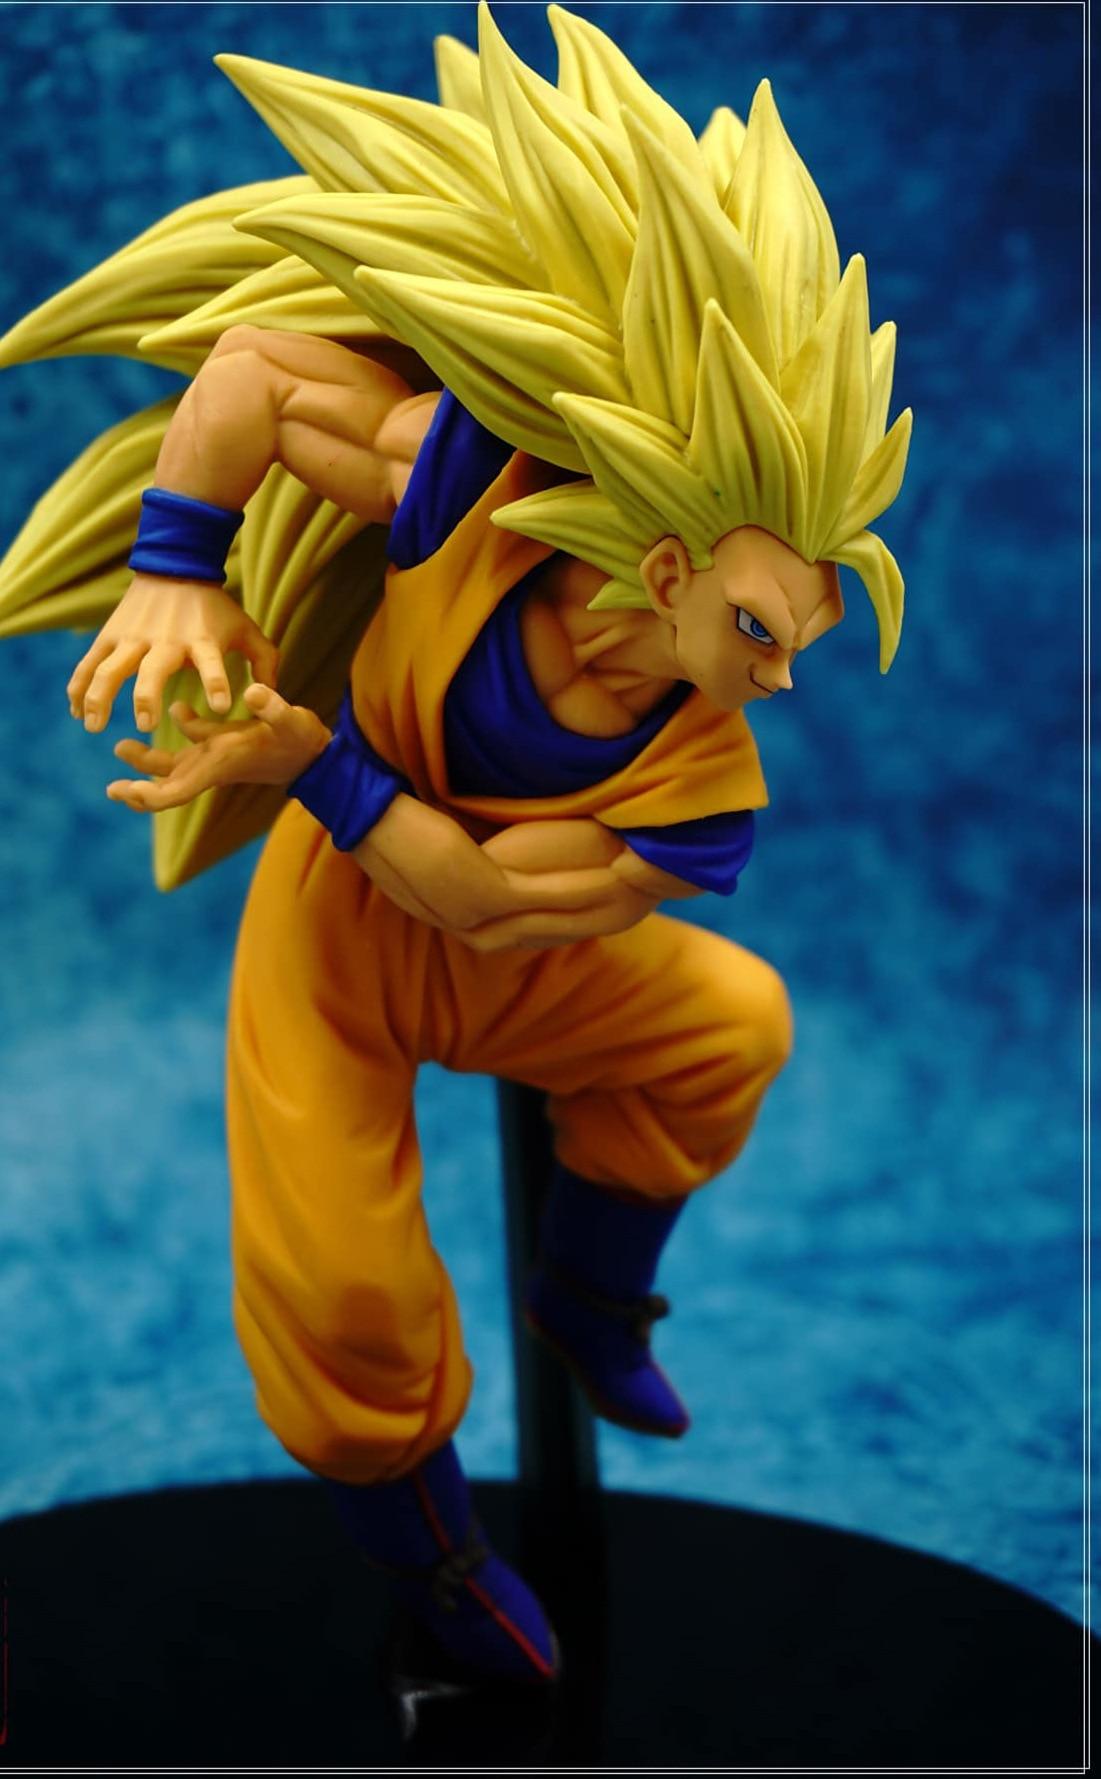 SCultures BIG Dragon Ball Z Super Saiyan 3 Son Sokou Goku PVC Action Figure Collectible Model Toy 18cm KT3210<br><br>Aliexpress